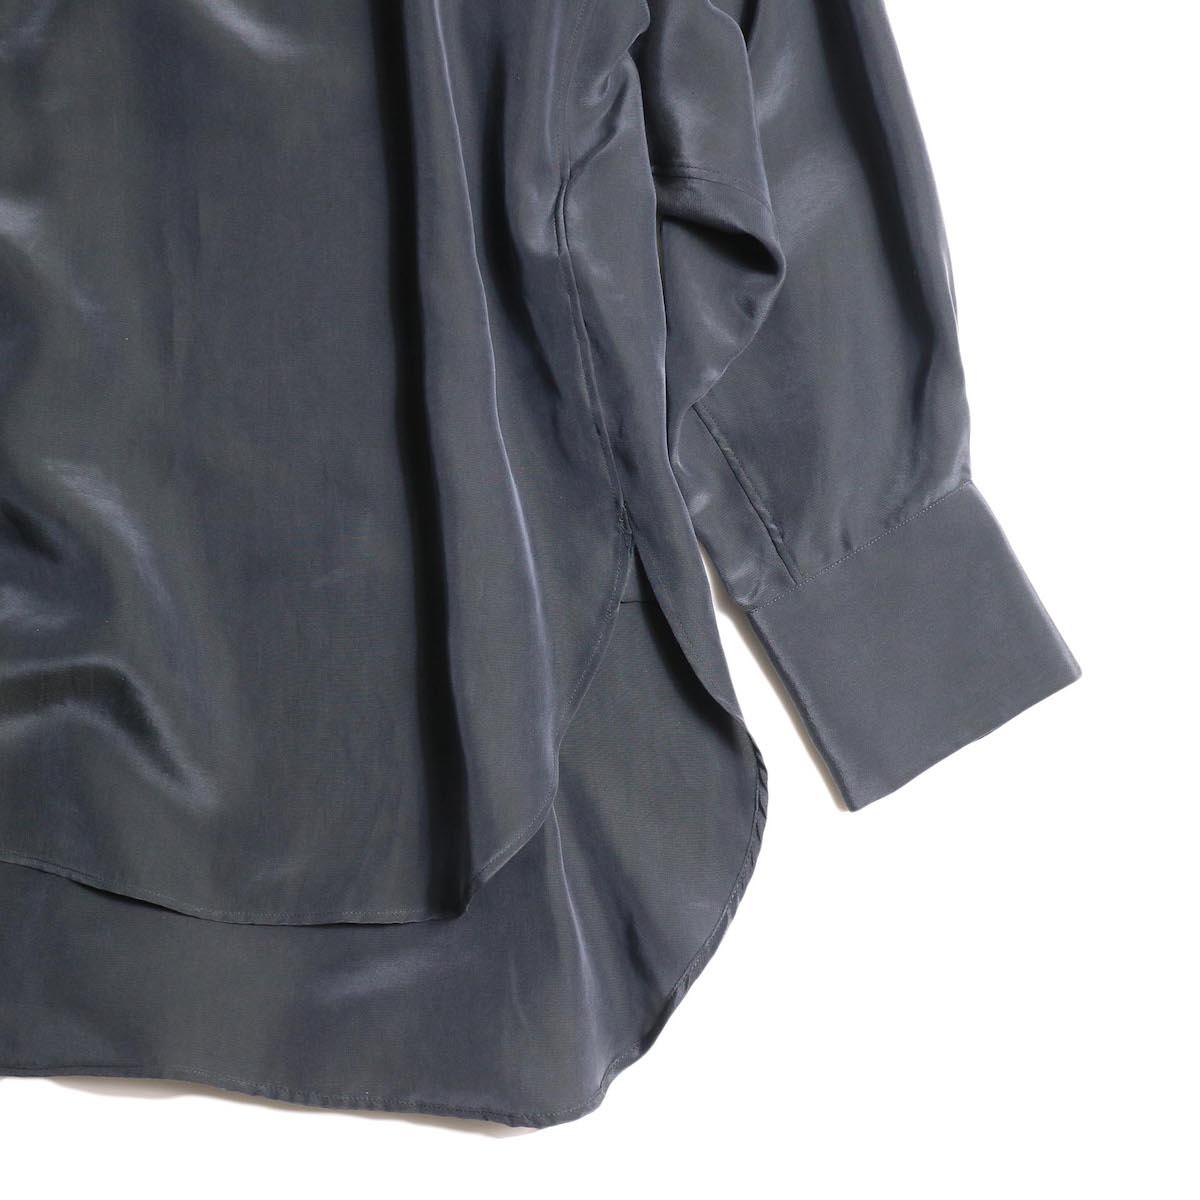 YLEVE / SILK CUPRA SUEDE BL (charcoal) 袖